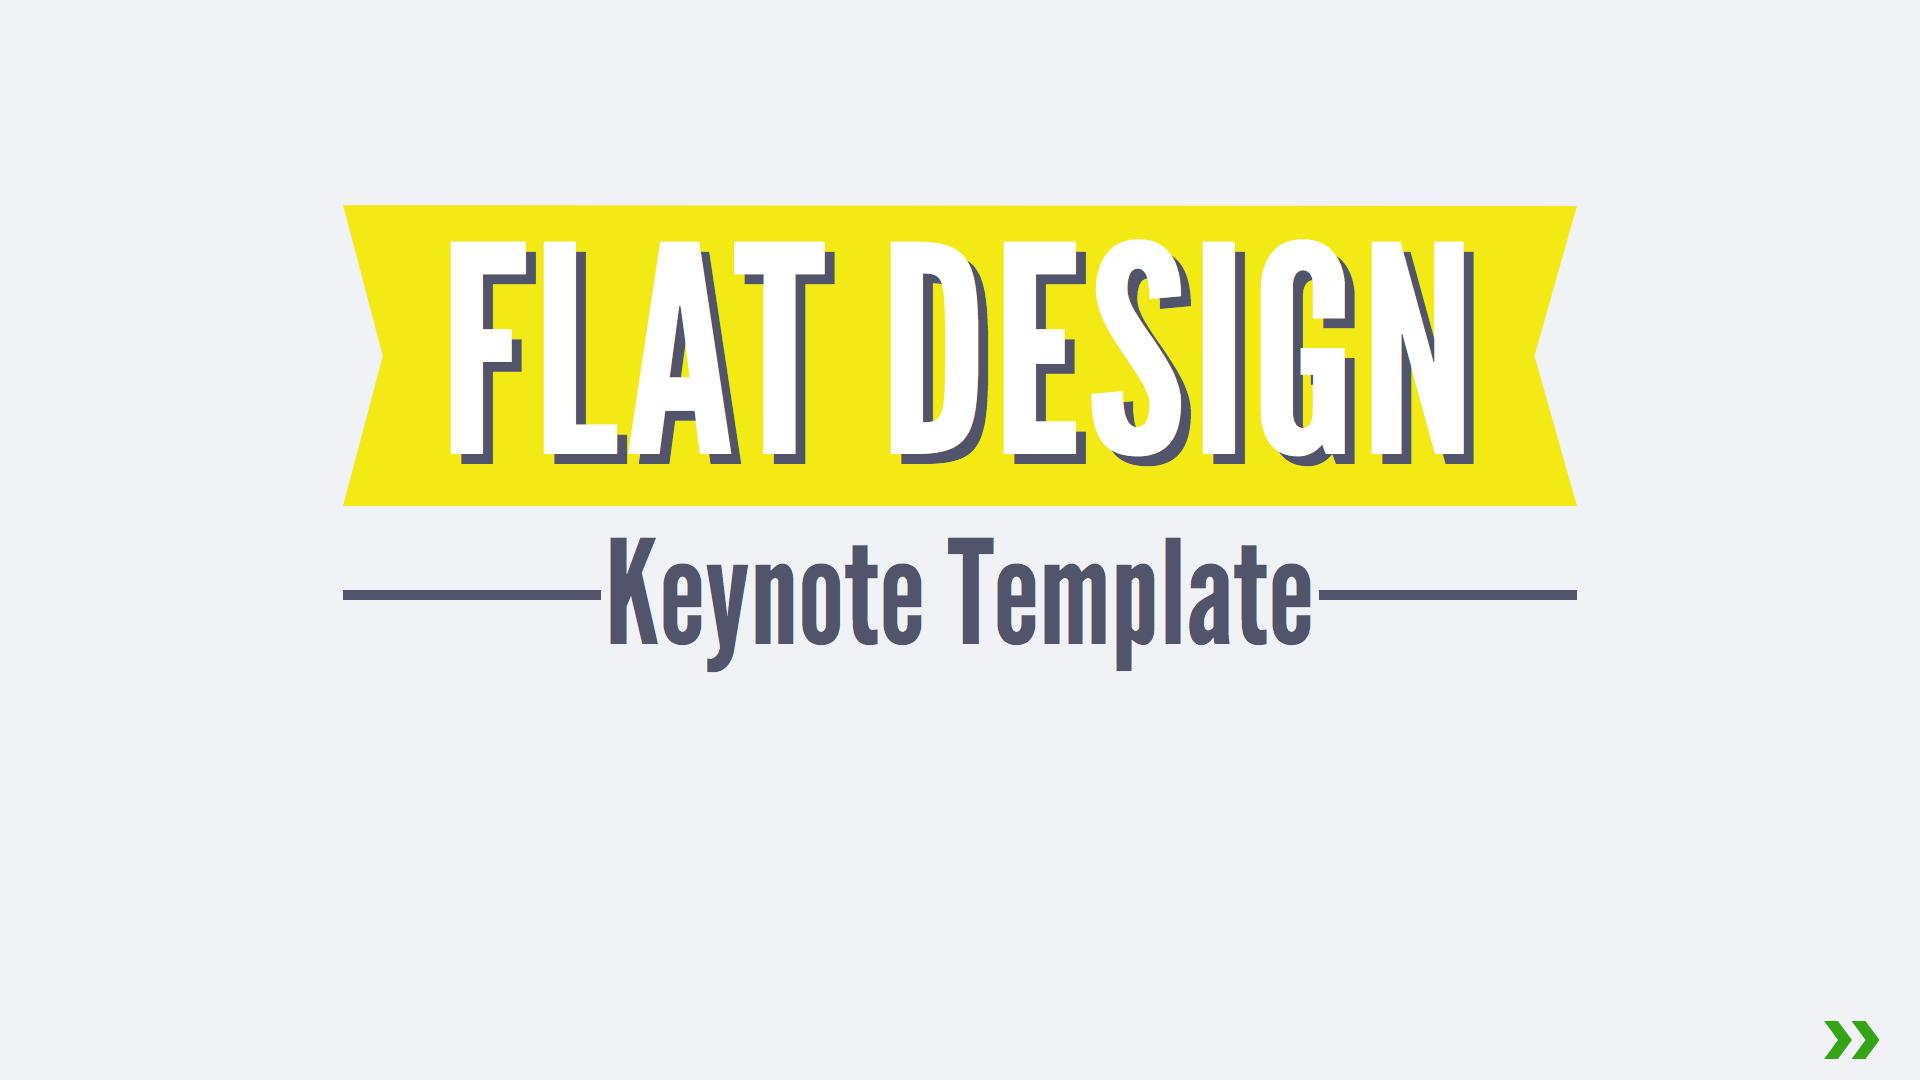 Flat Design Keynote Template Creative Templates 01 Preview1 Jpg 02 Preview2 03 Preview3 04 Preview4 05 Preview5 06 Preview6